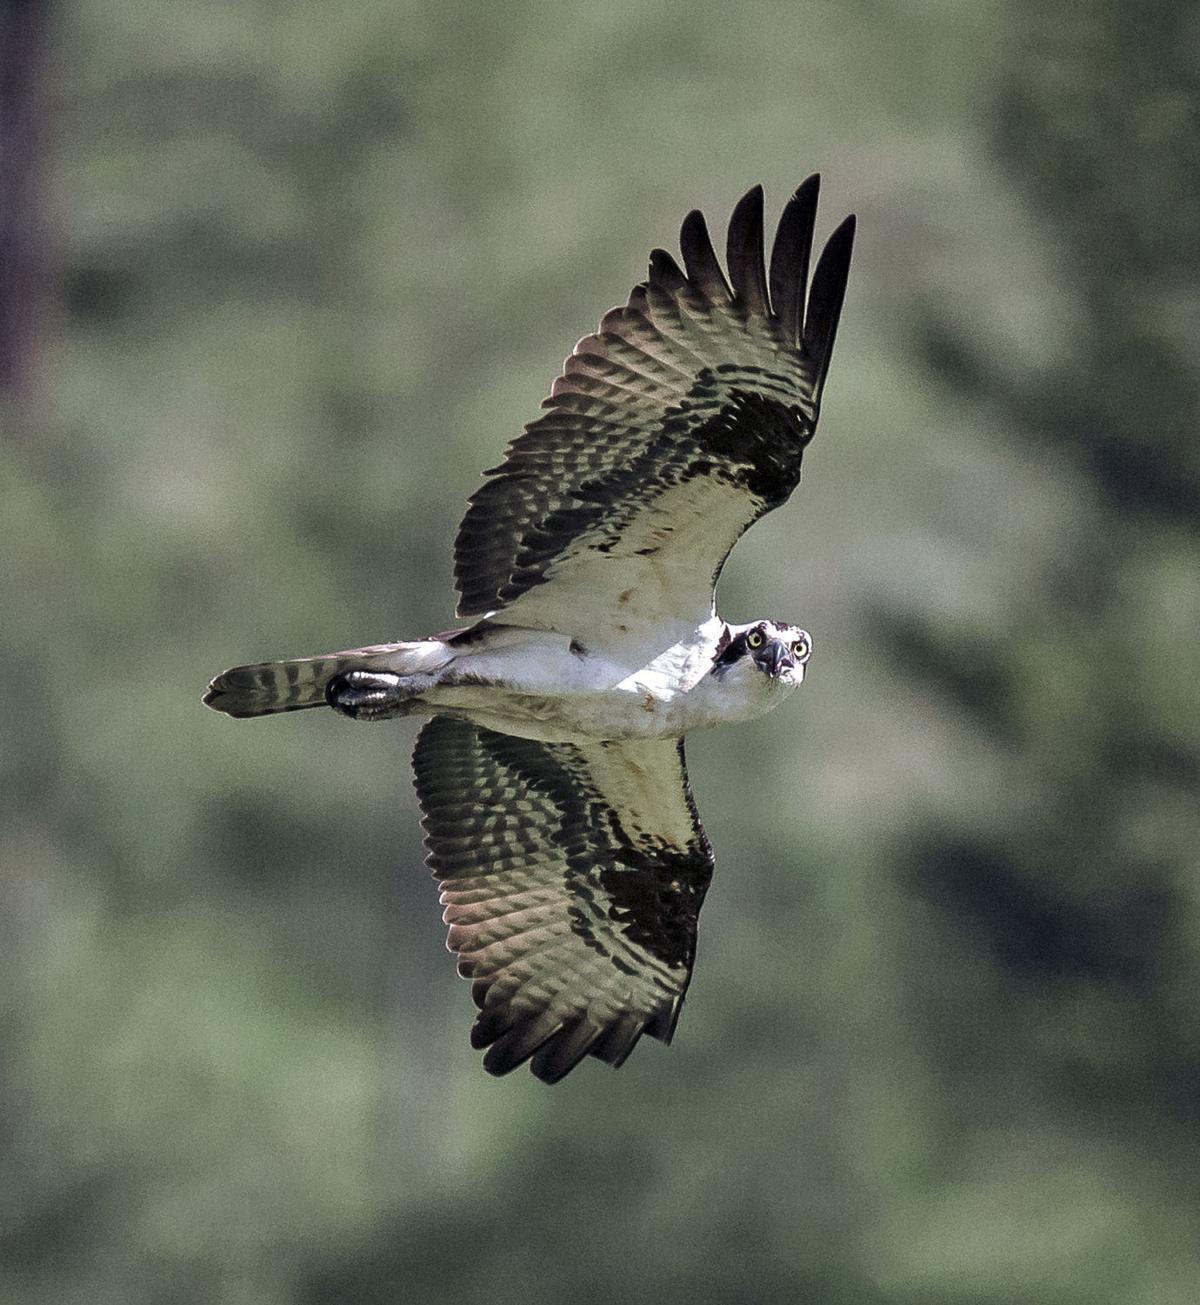 Ospreys are conservation success story